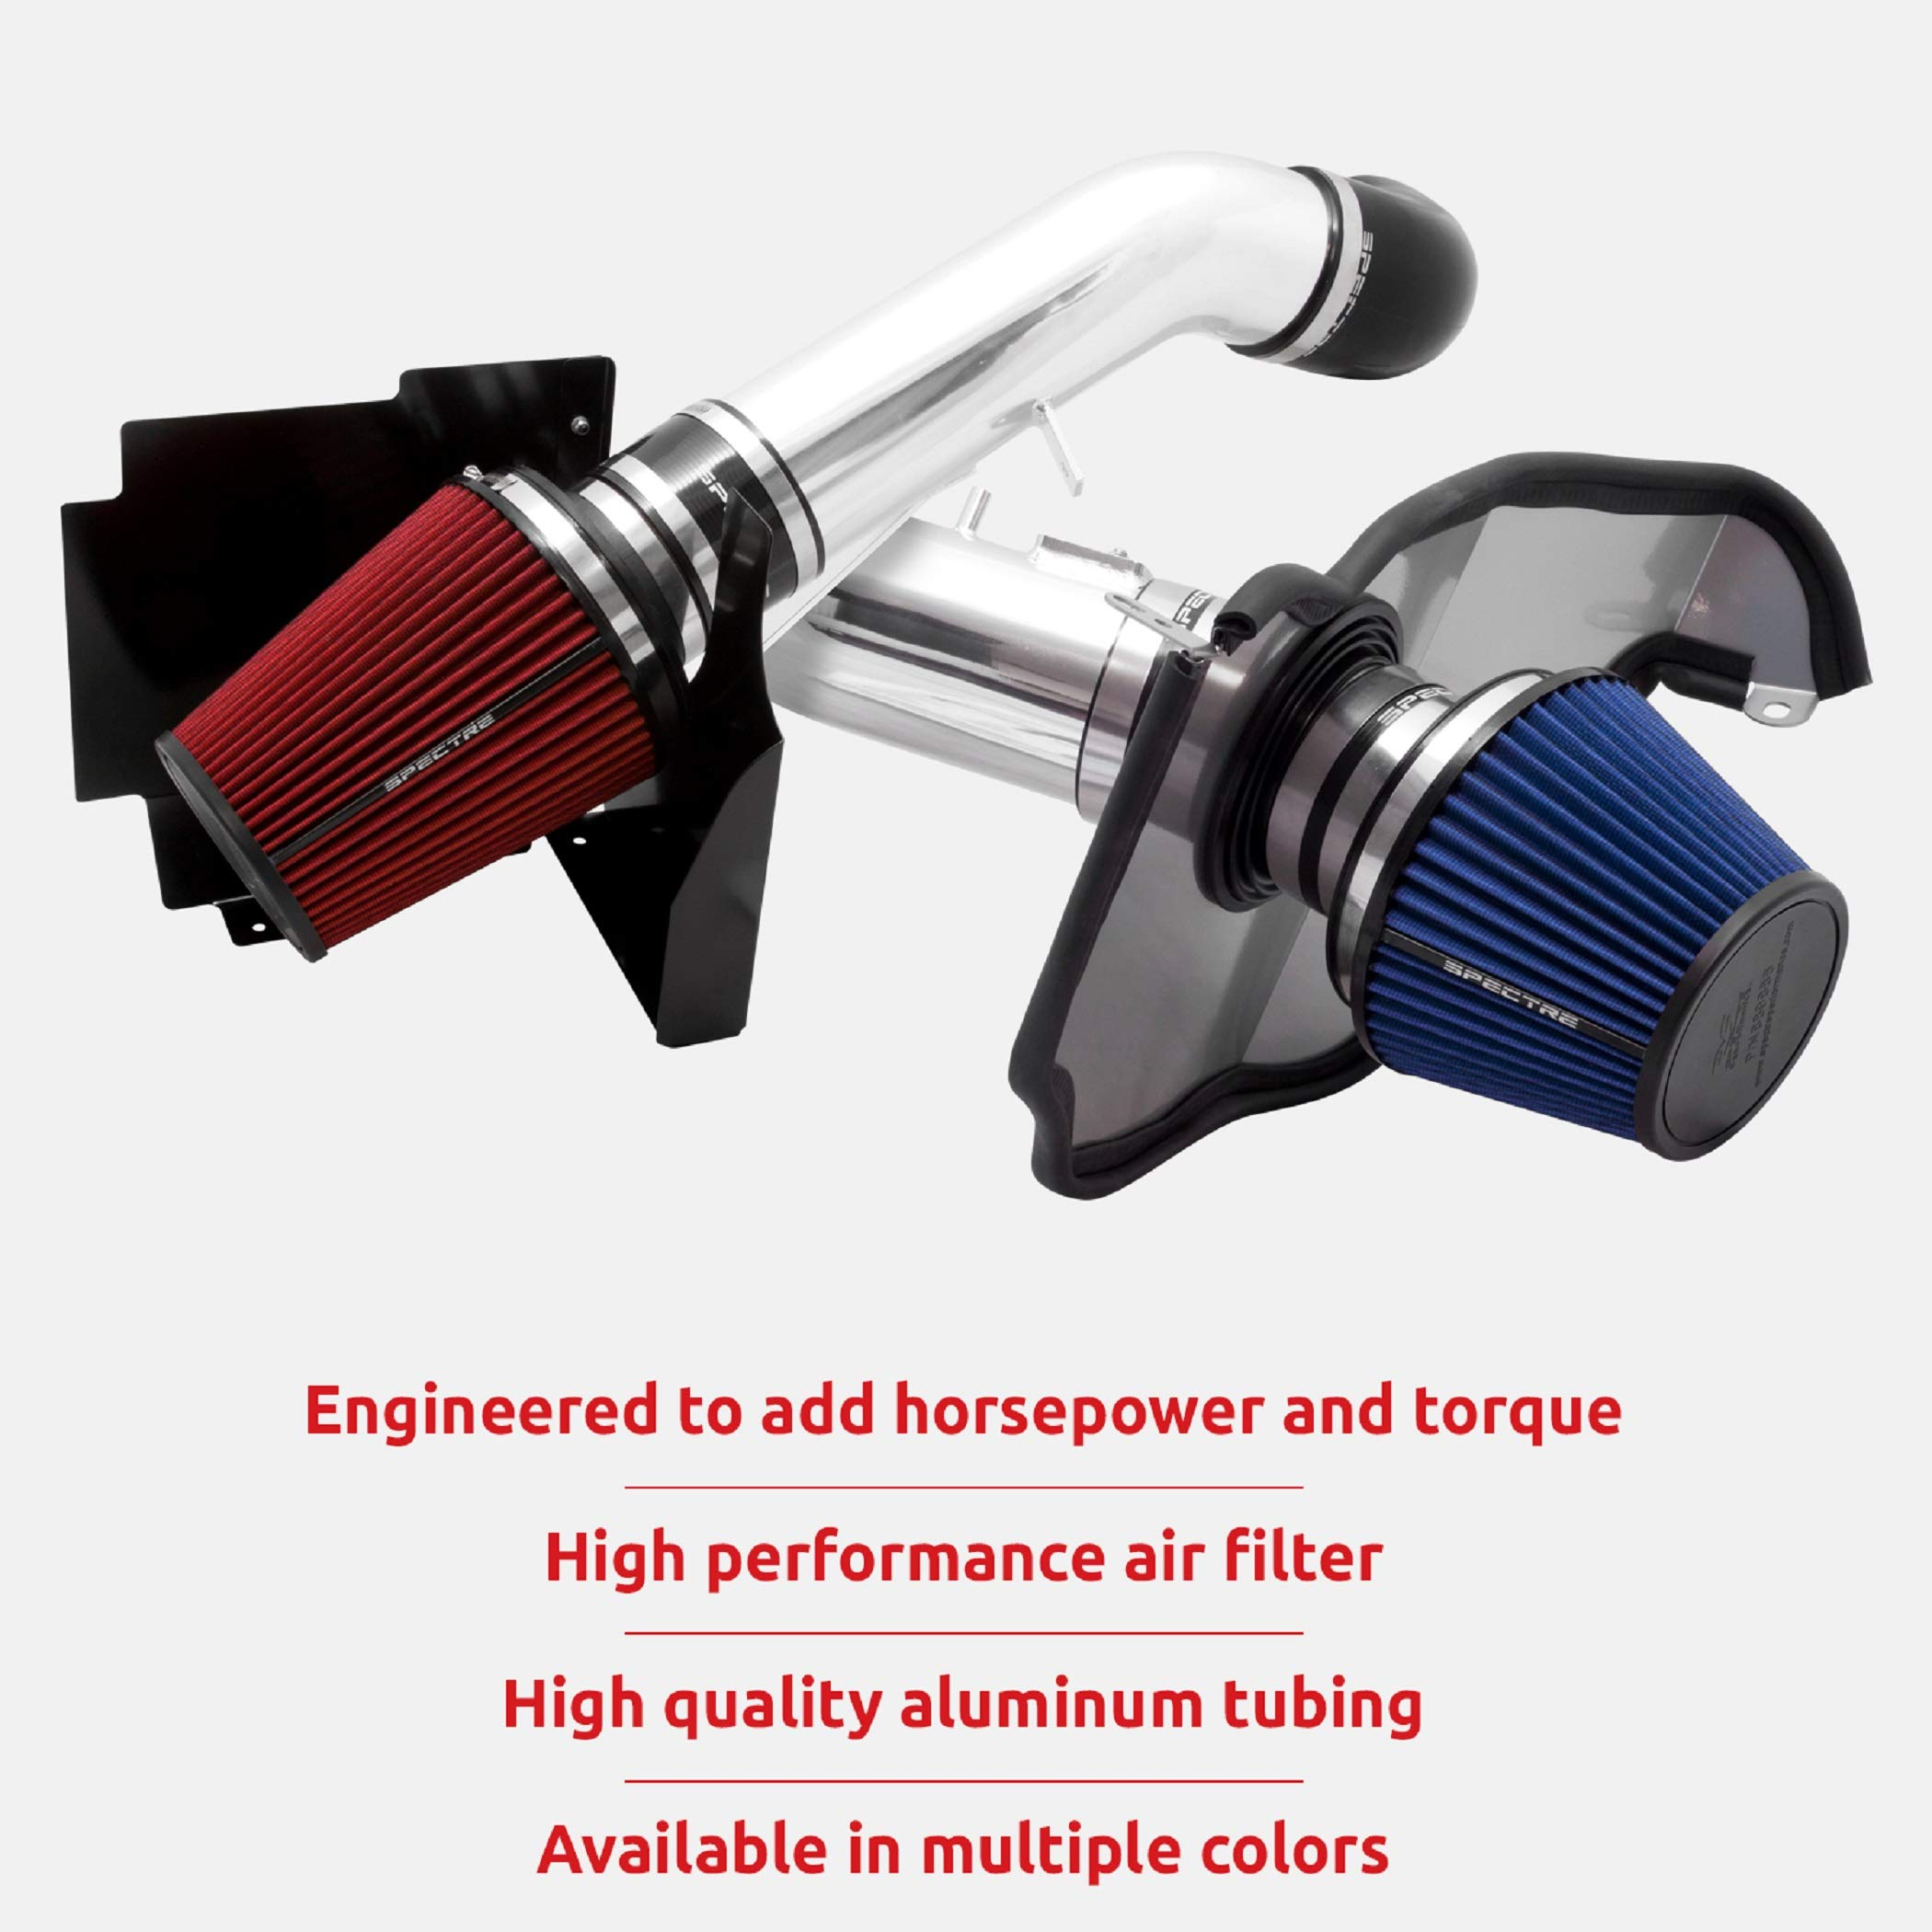 Spectre Performance Air Intake Kit: High Performance, Desgined to Increase Horsepower: Fits 1999-2007 CHEVROLET/GMC/CADILLAC (Silverado, Avalanche, Suburban, Tahoe, Sierra, Yukon, Escalade) SPE-9900